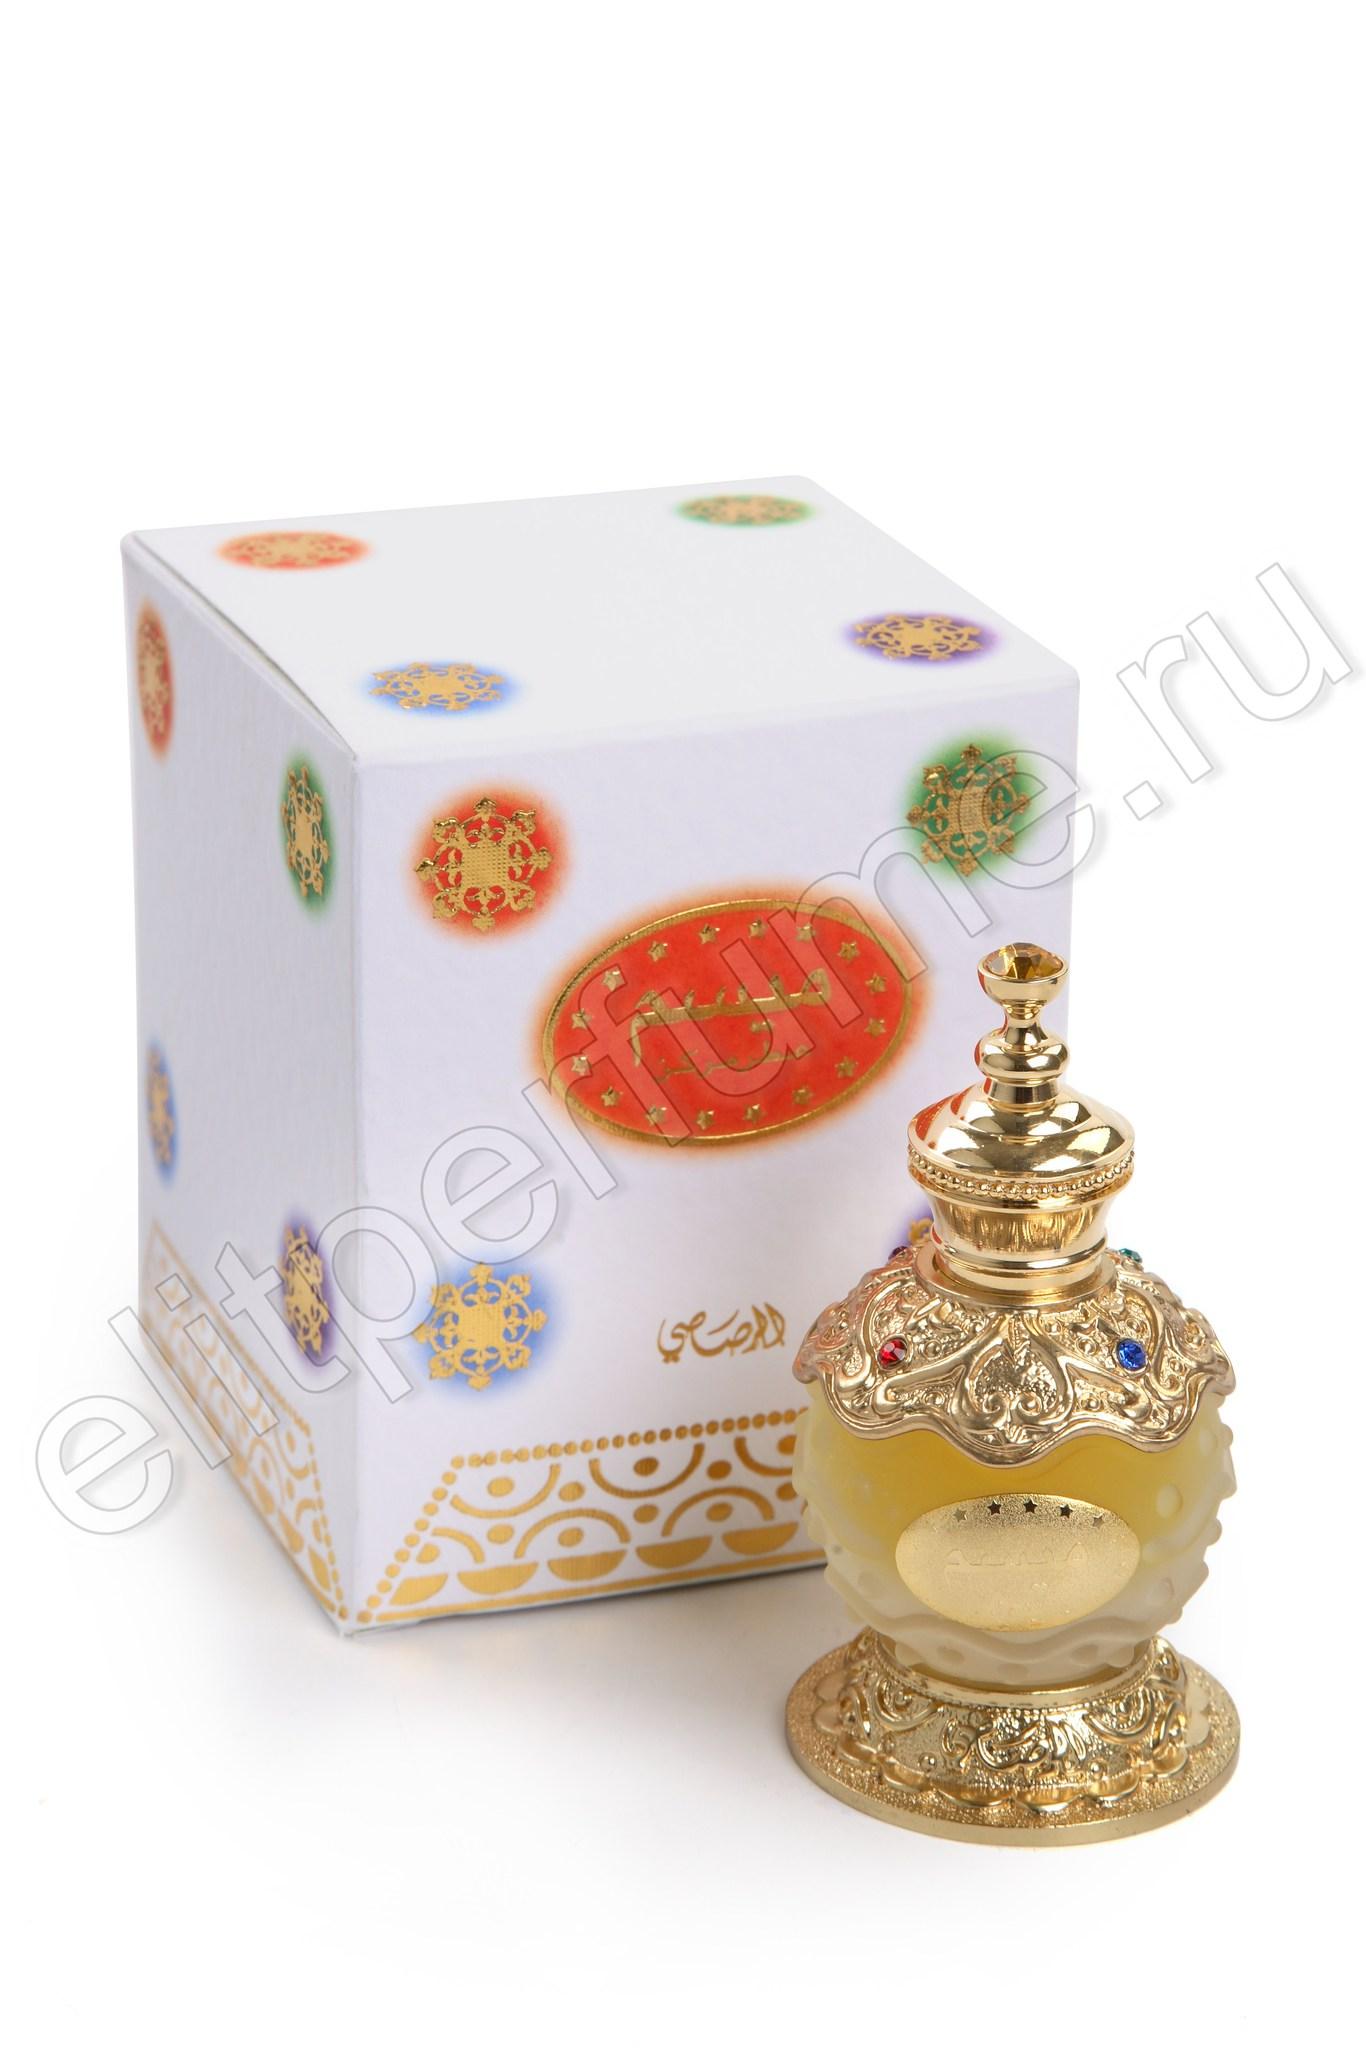 Арабские духи Майсам Maisam 20 мл арабские масляные духи от Расаси Rasasi Perfumes